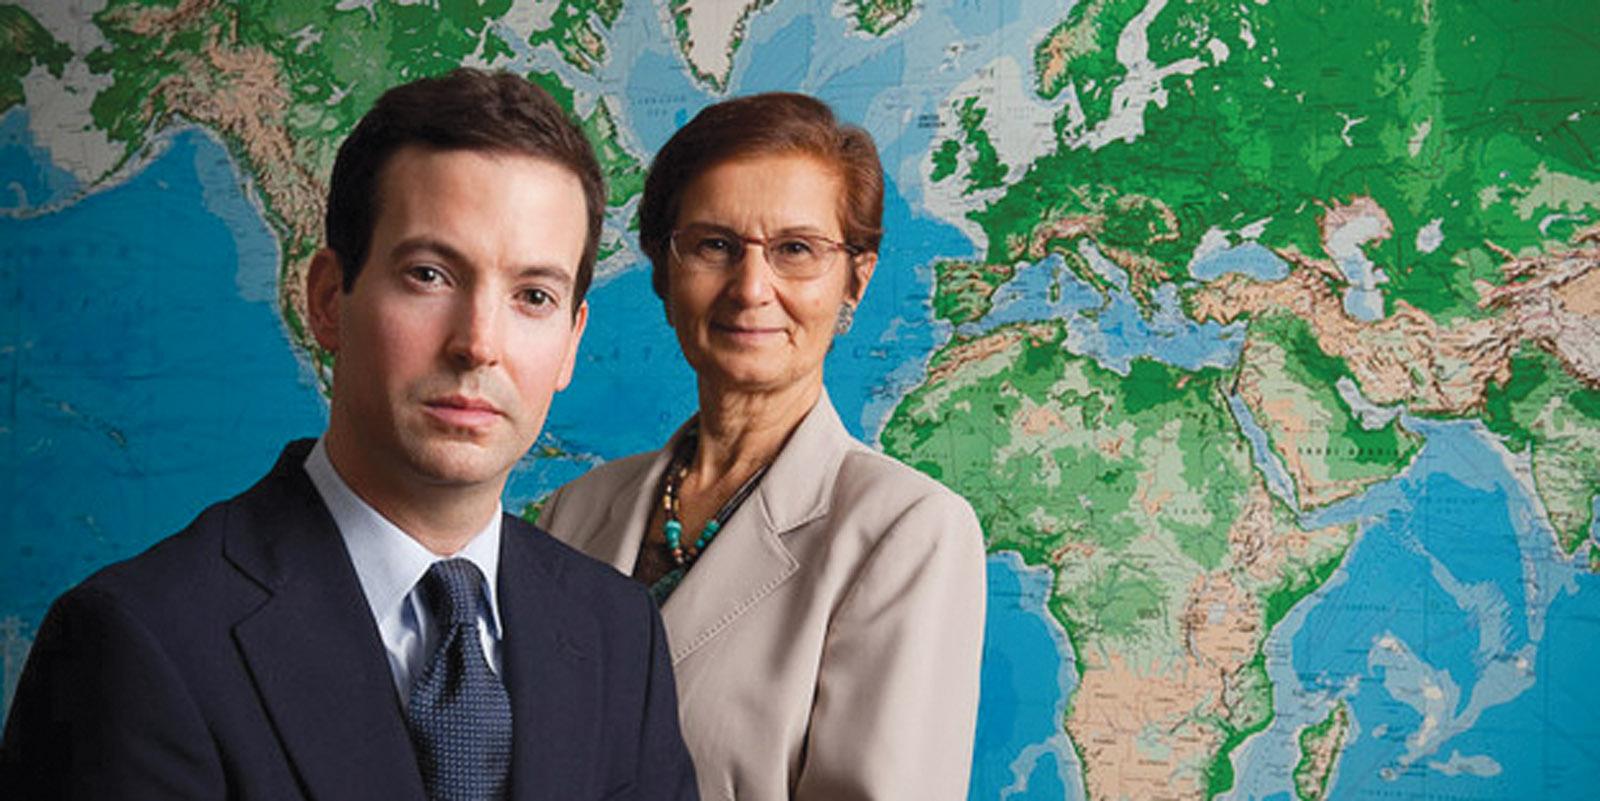 USD Professors Avi Spiegel and Necla Tschirgi